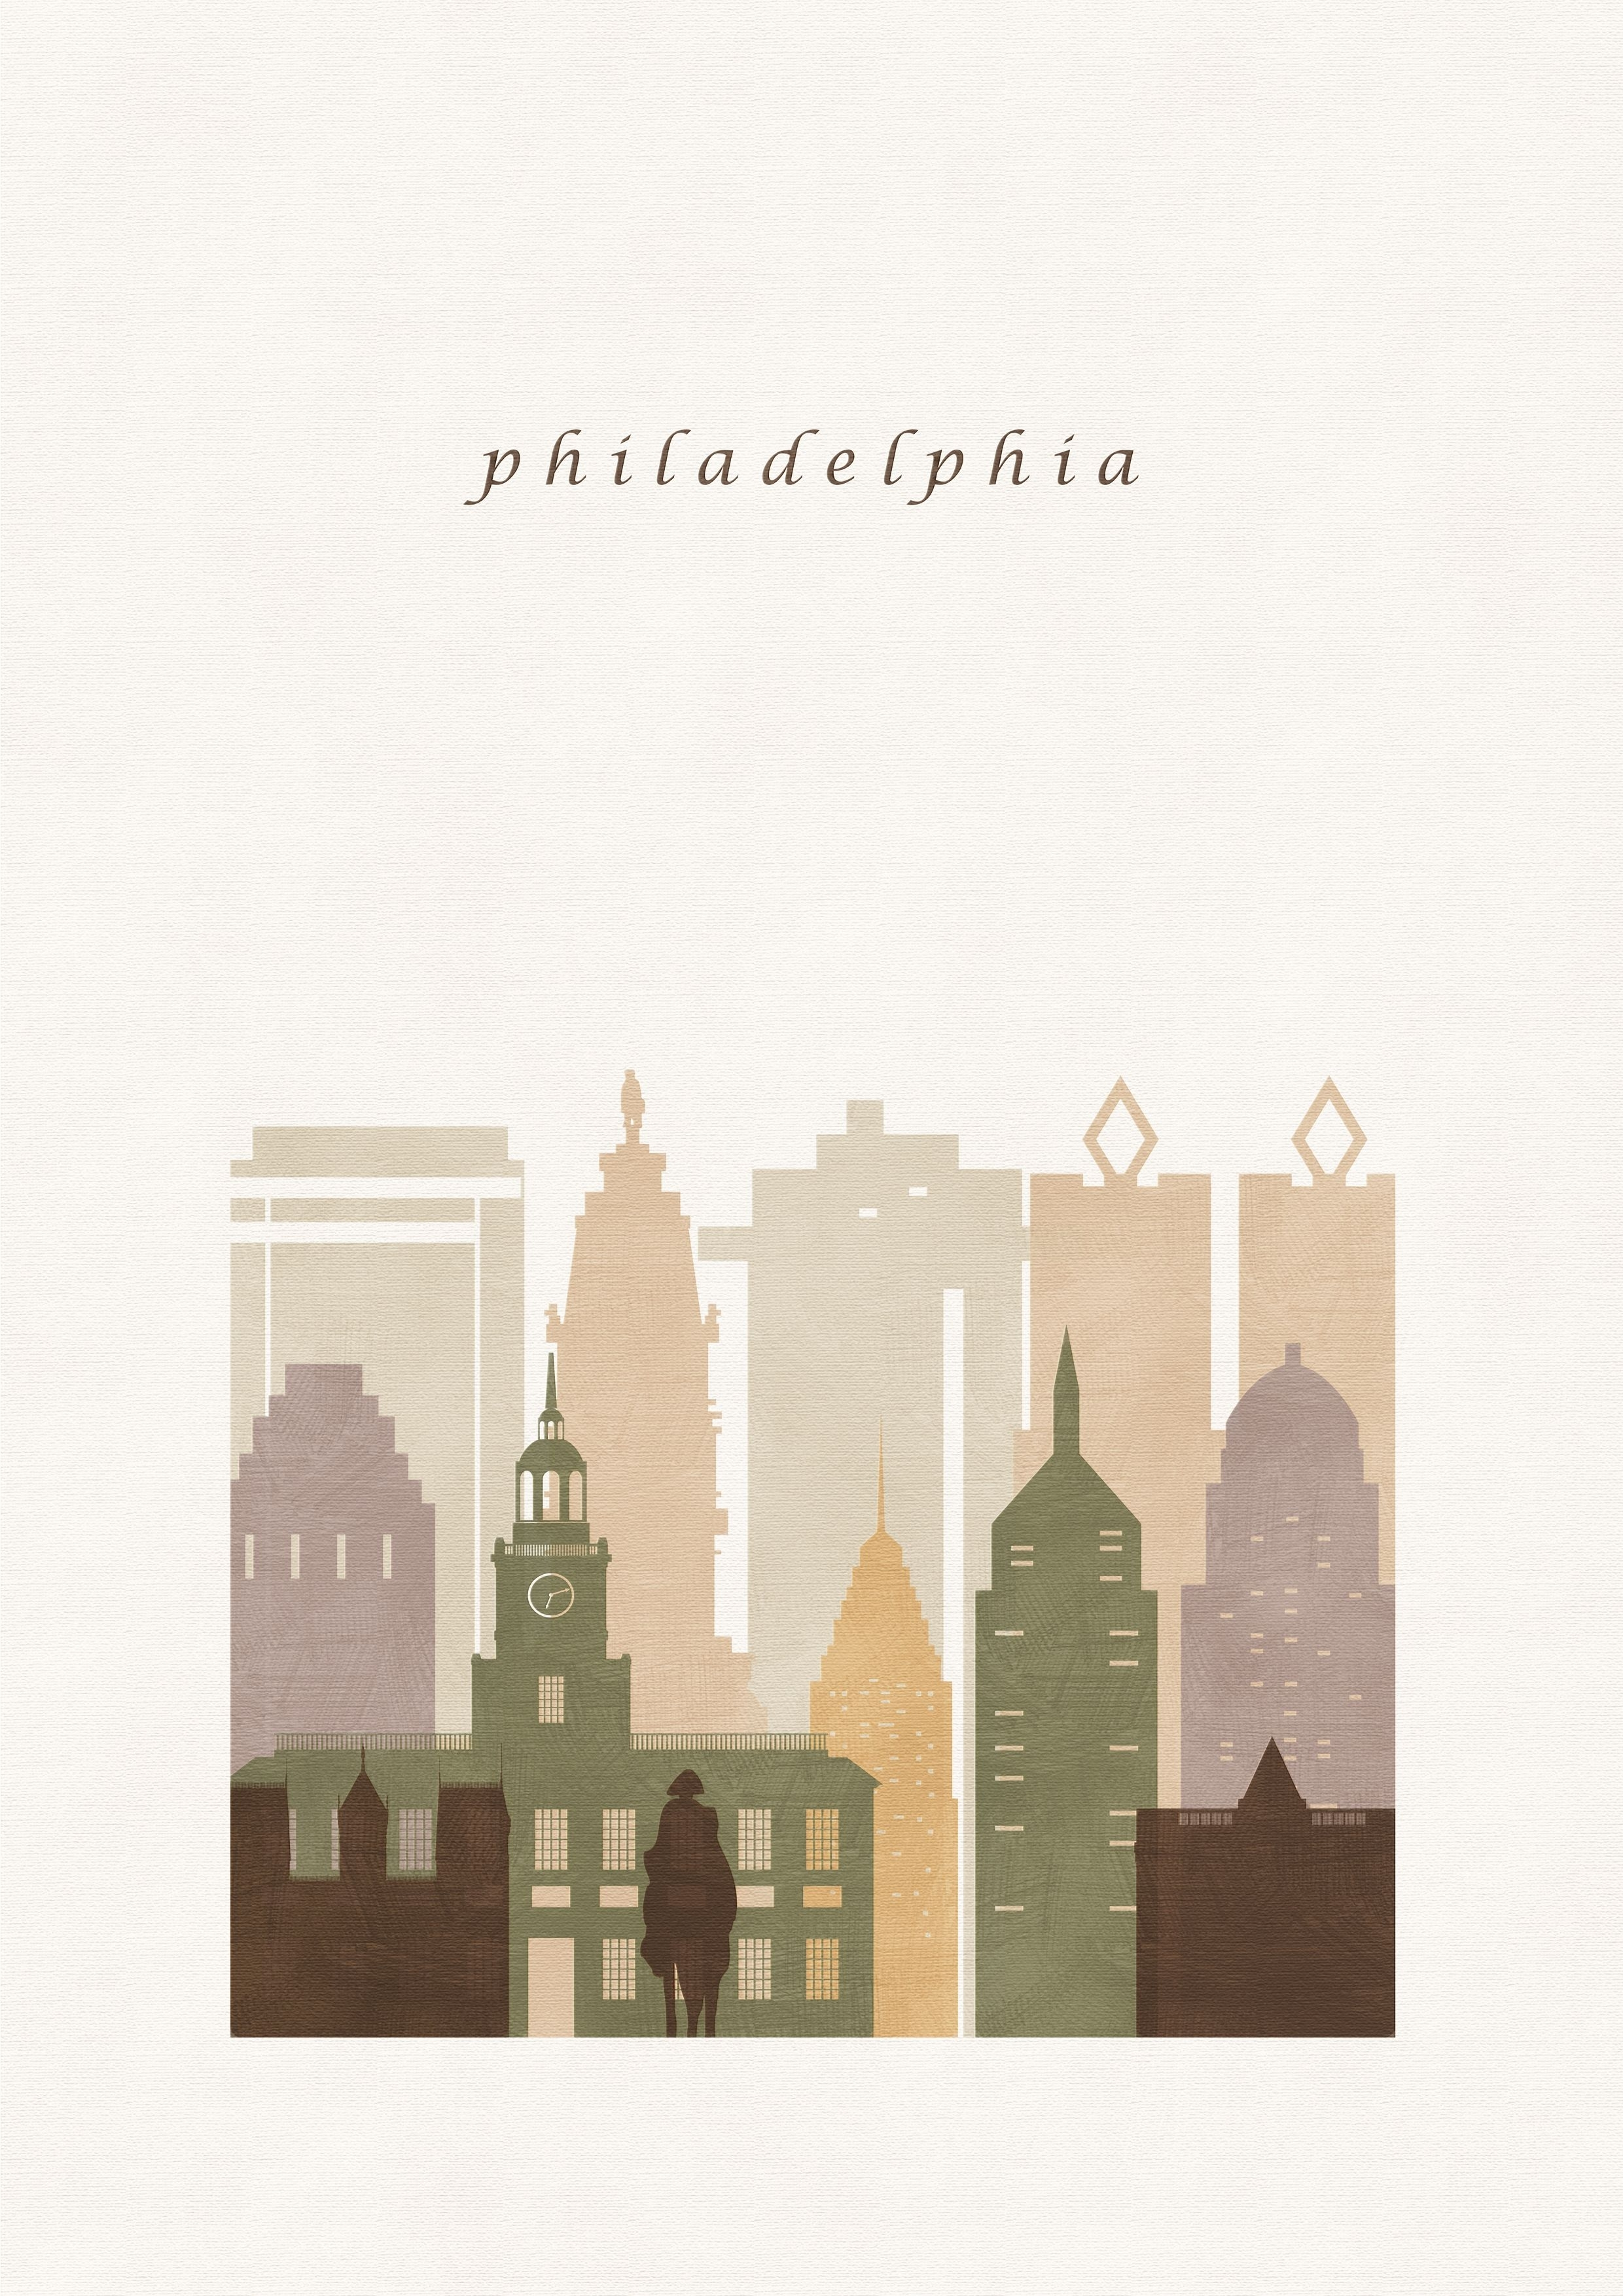 Philadelphia Travel Poster, Pa, Poster Print Download, Modern Art Intended For Philadelphia Map Wall Art (View 15 of 20)